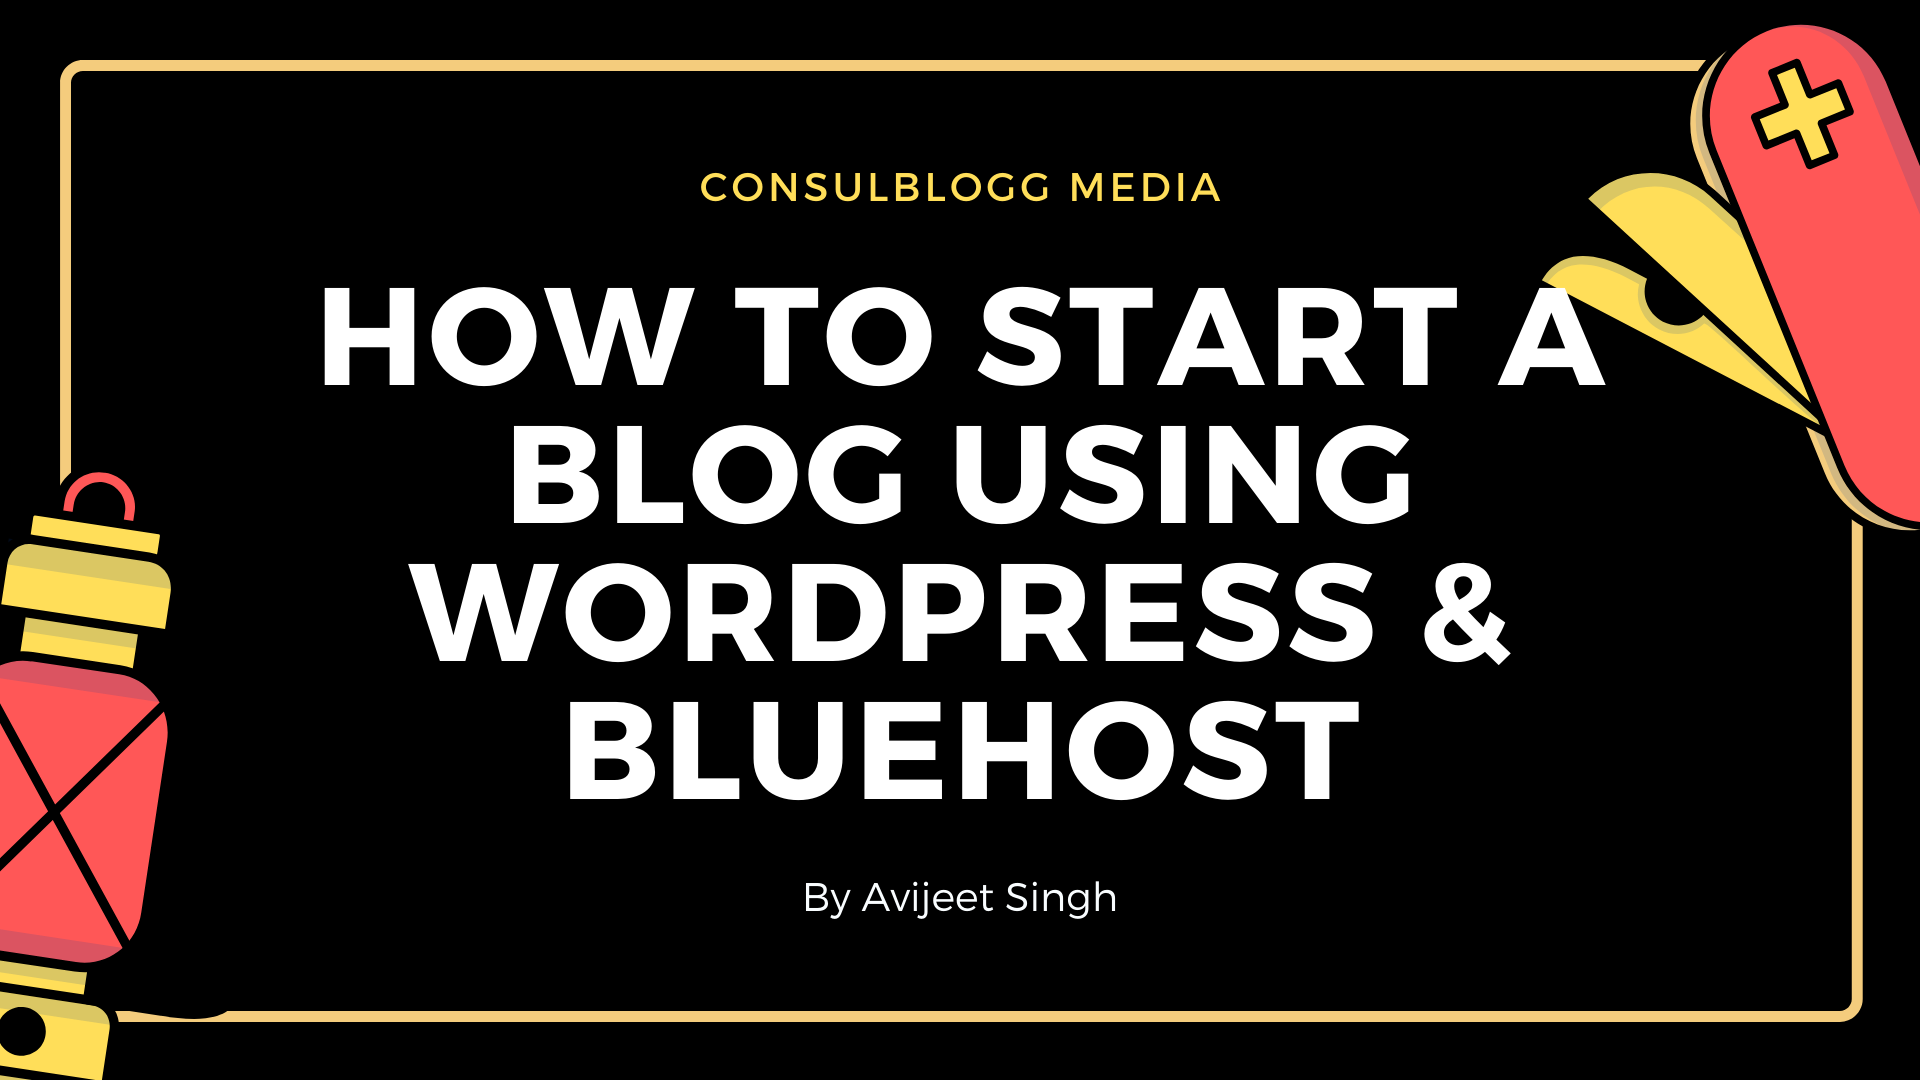 How to start a blog using WordPress & Bluehost